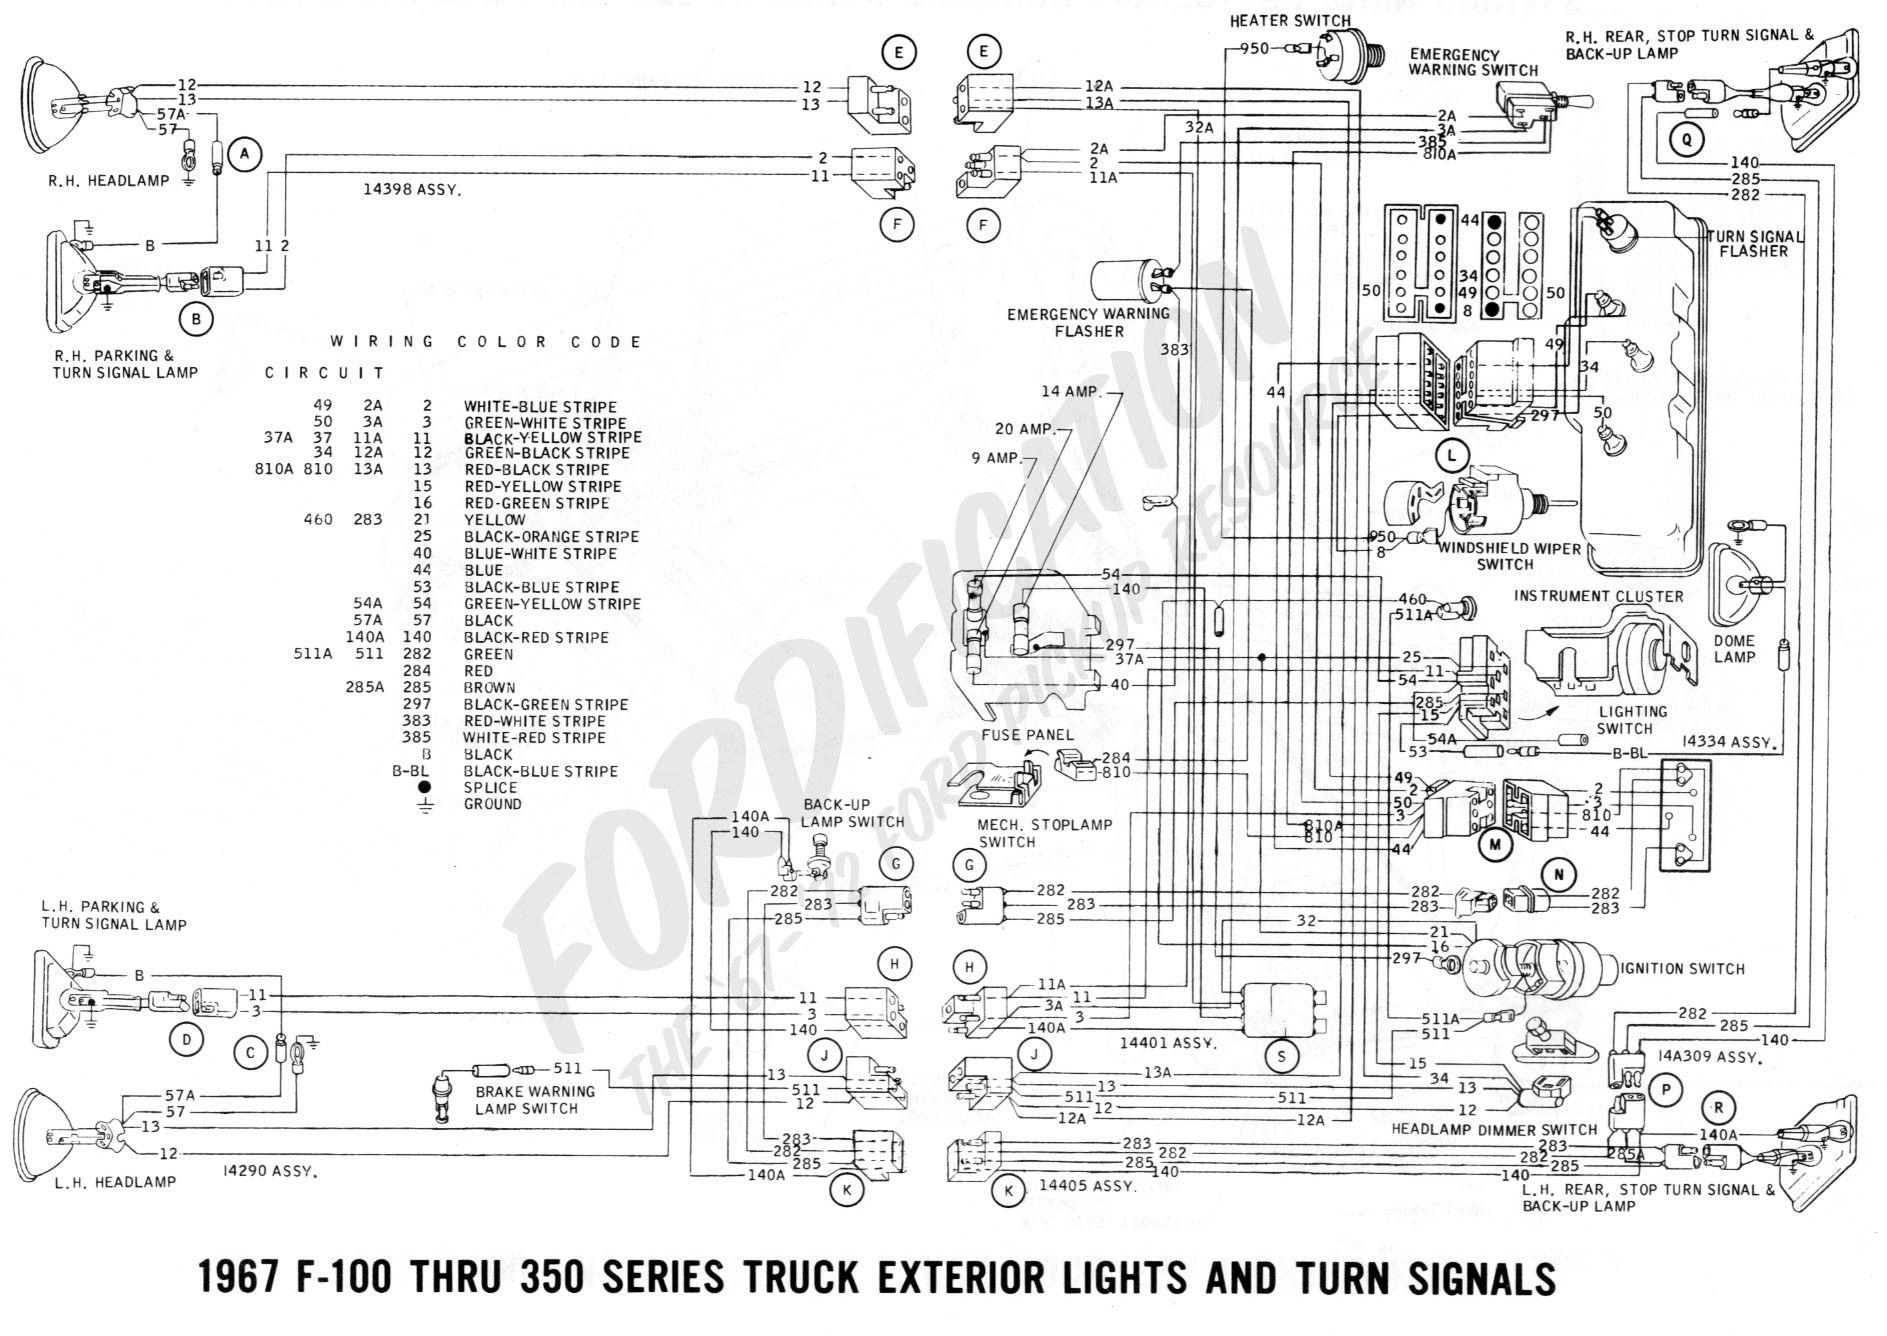 Turn Signal Switch Diagram In 2021 Jeep Grand Cherokee Laredo Diagram Design Wiring Diagram